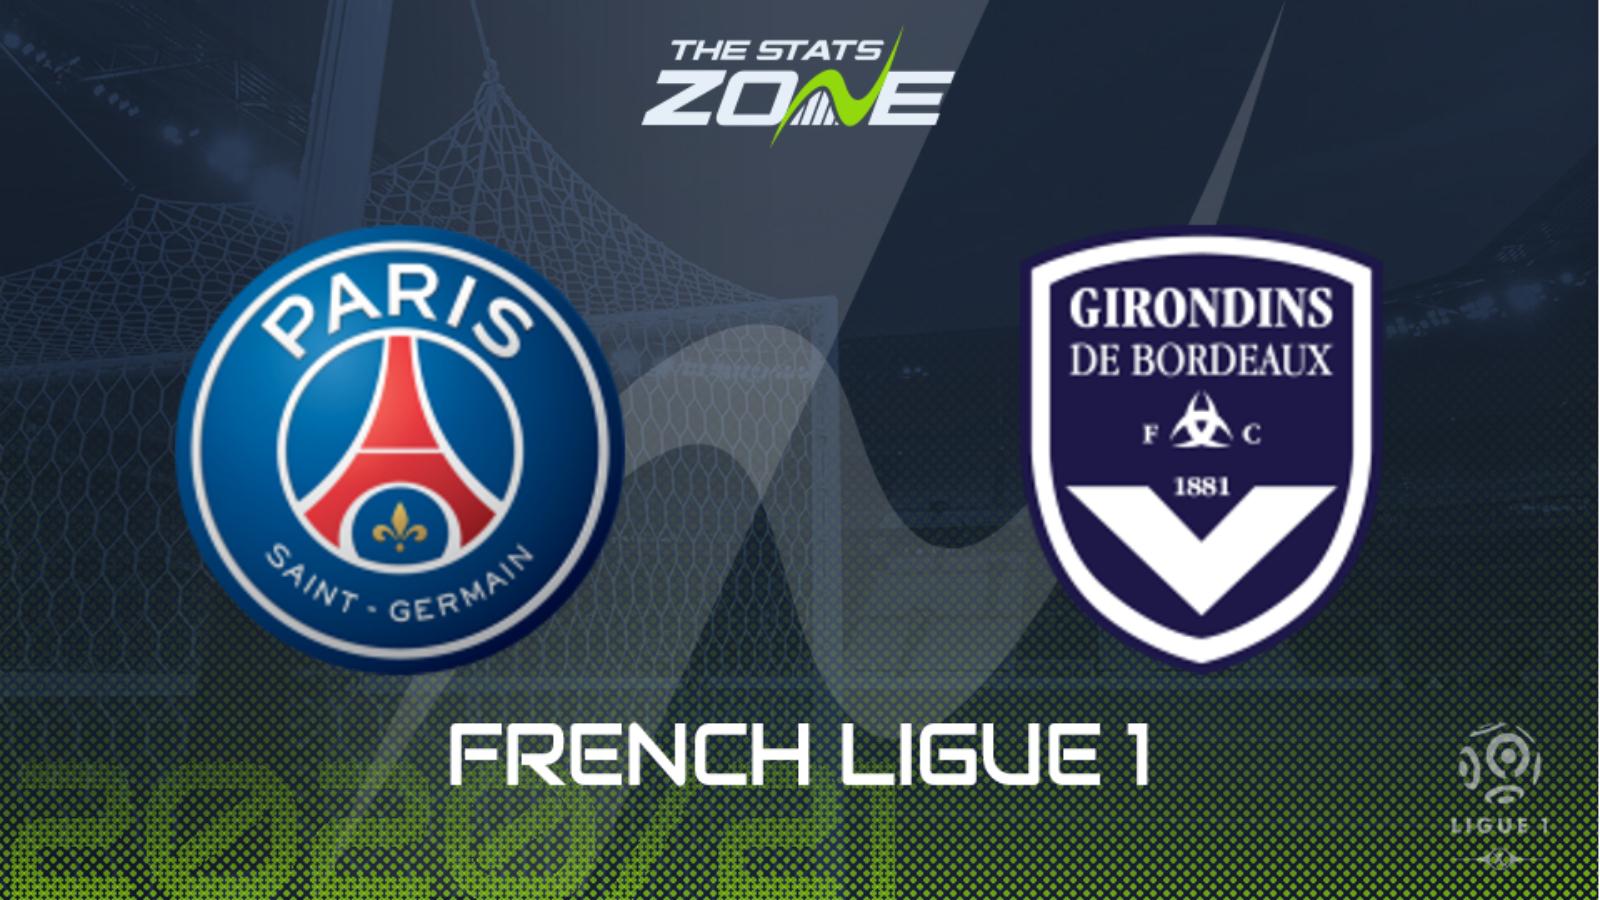 Bordeaux vs psg betting previews greyhound derby 2021 bettingadvice